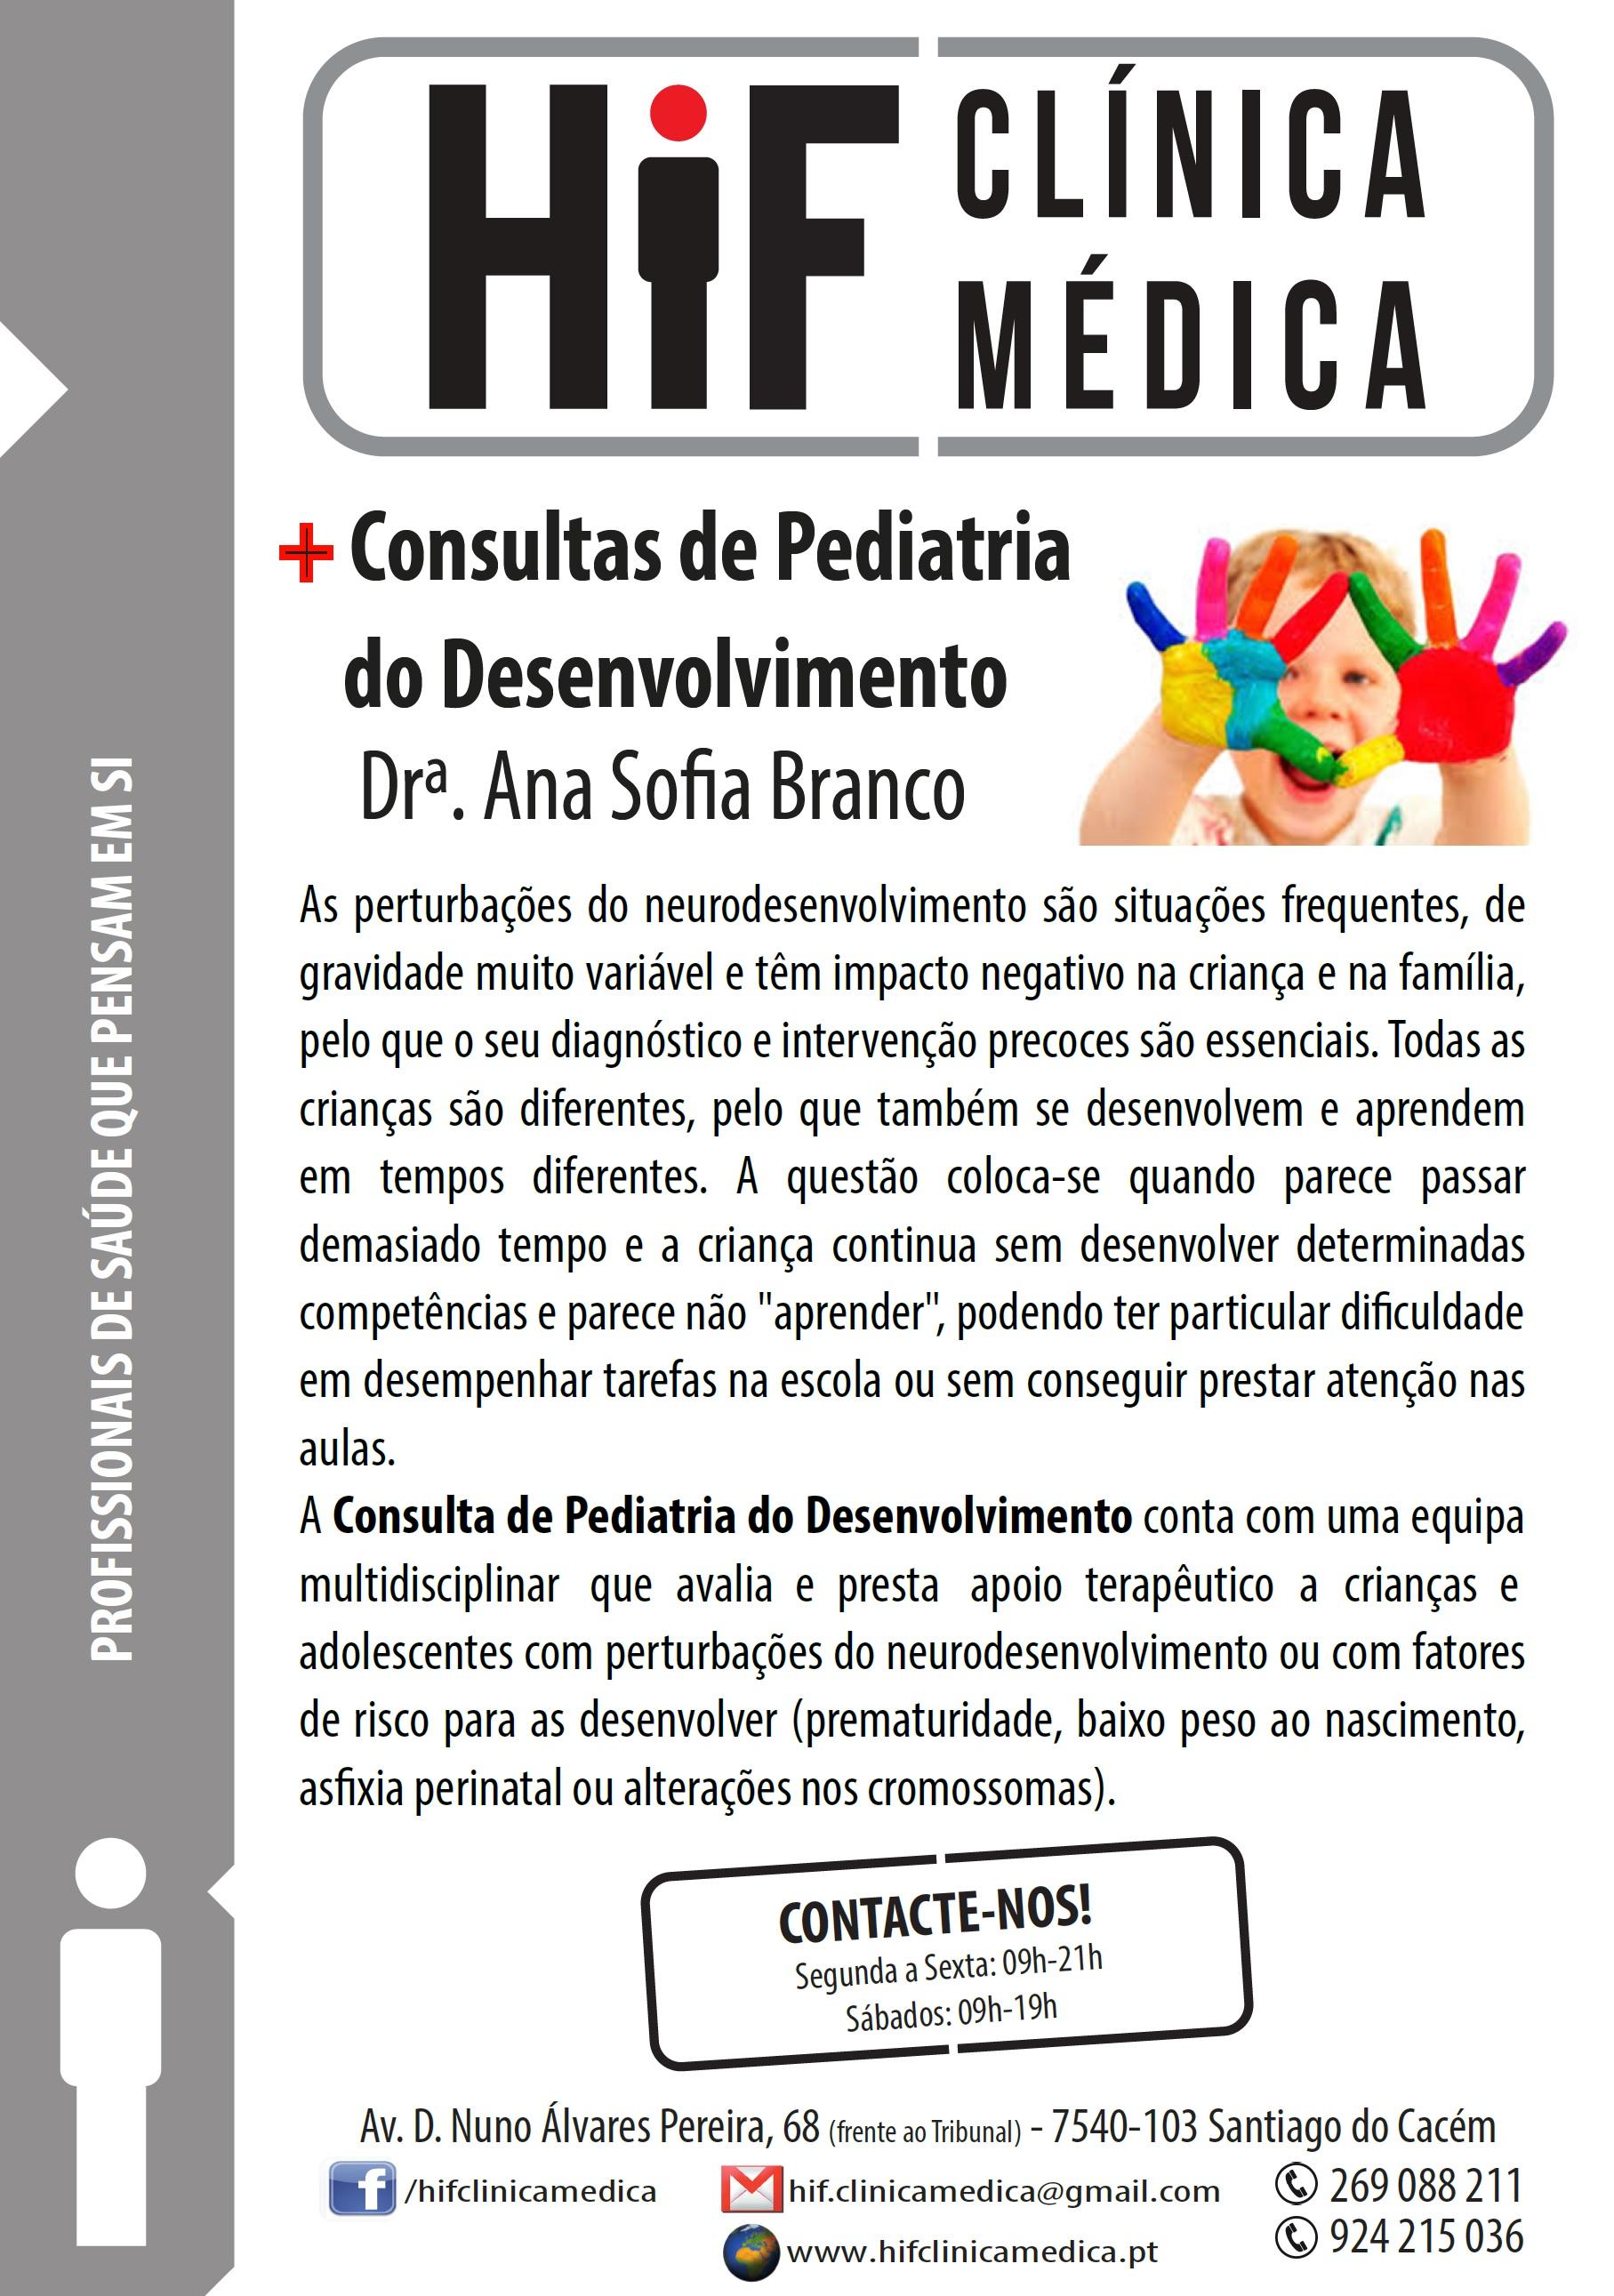 Pediatria do Desenvolvimento - HiF